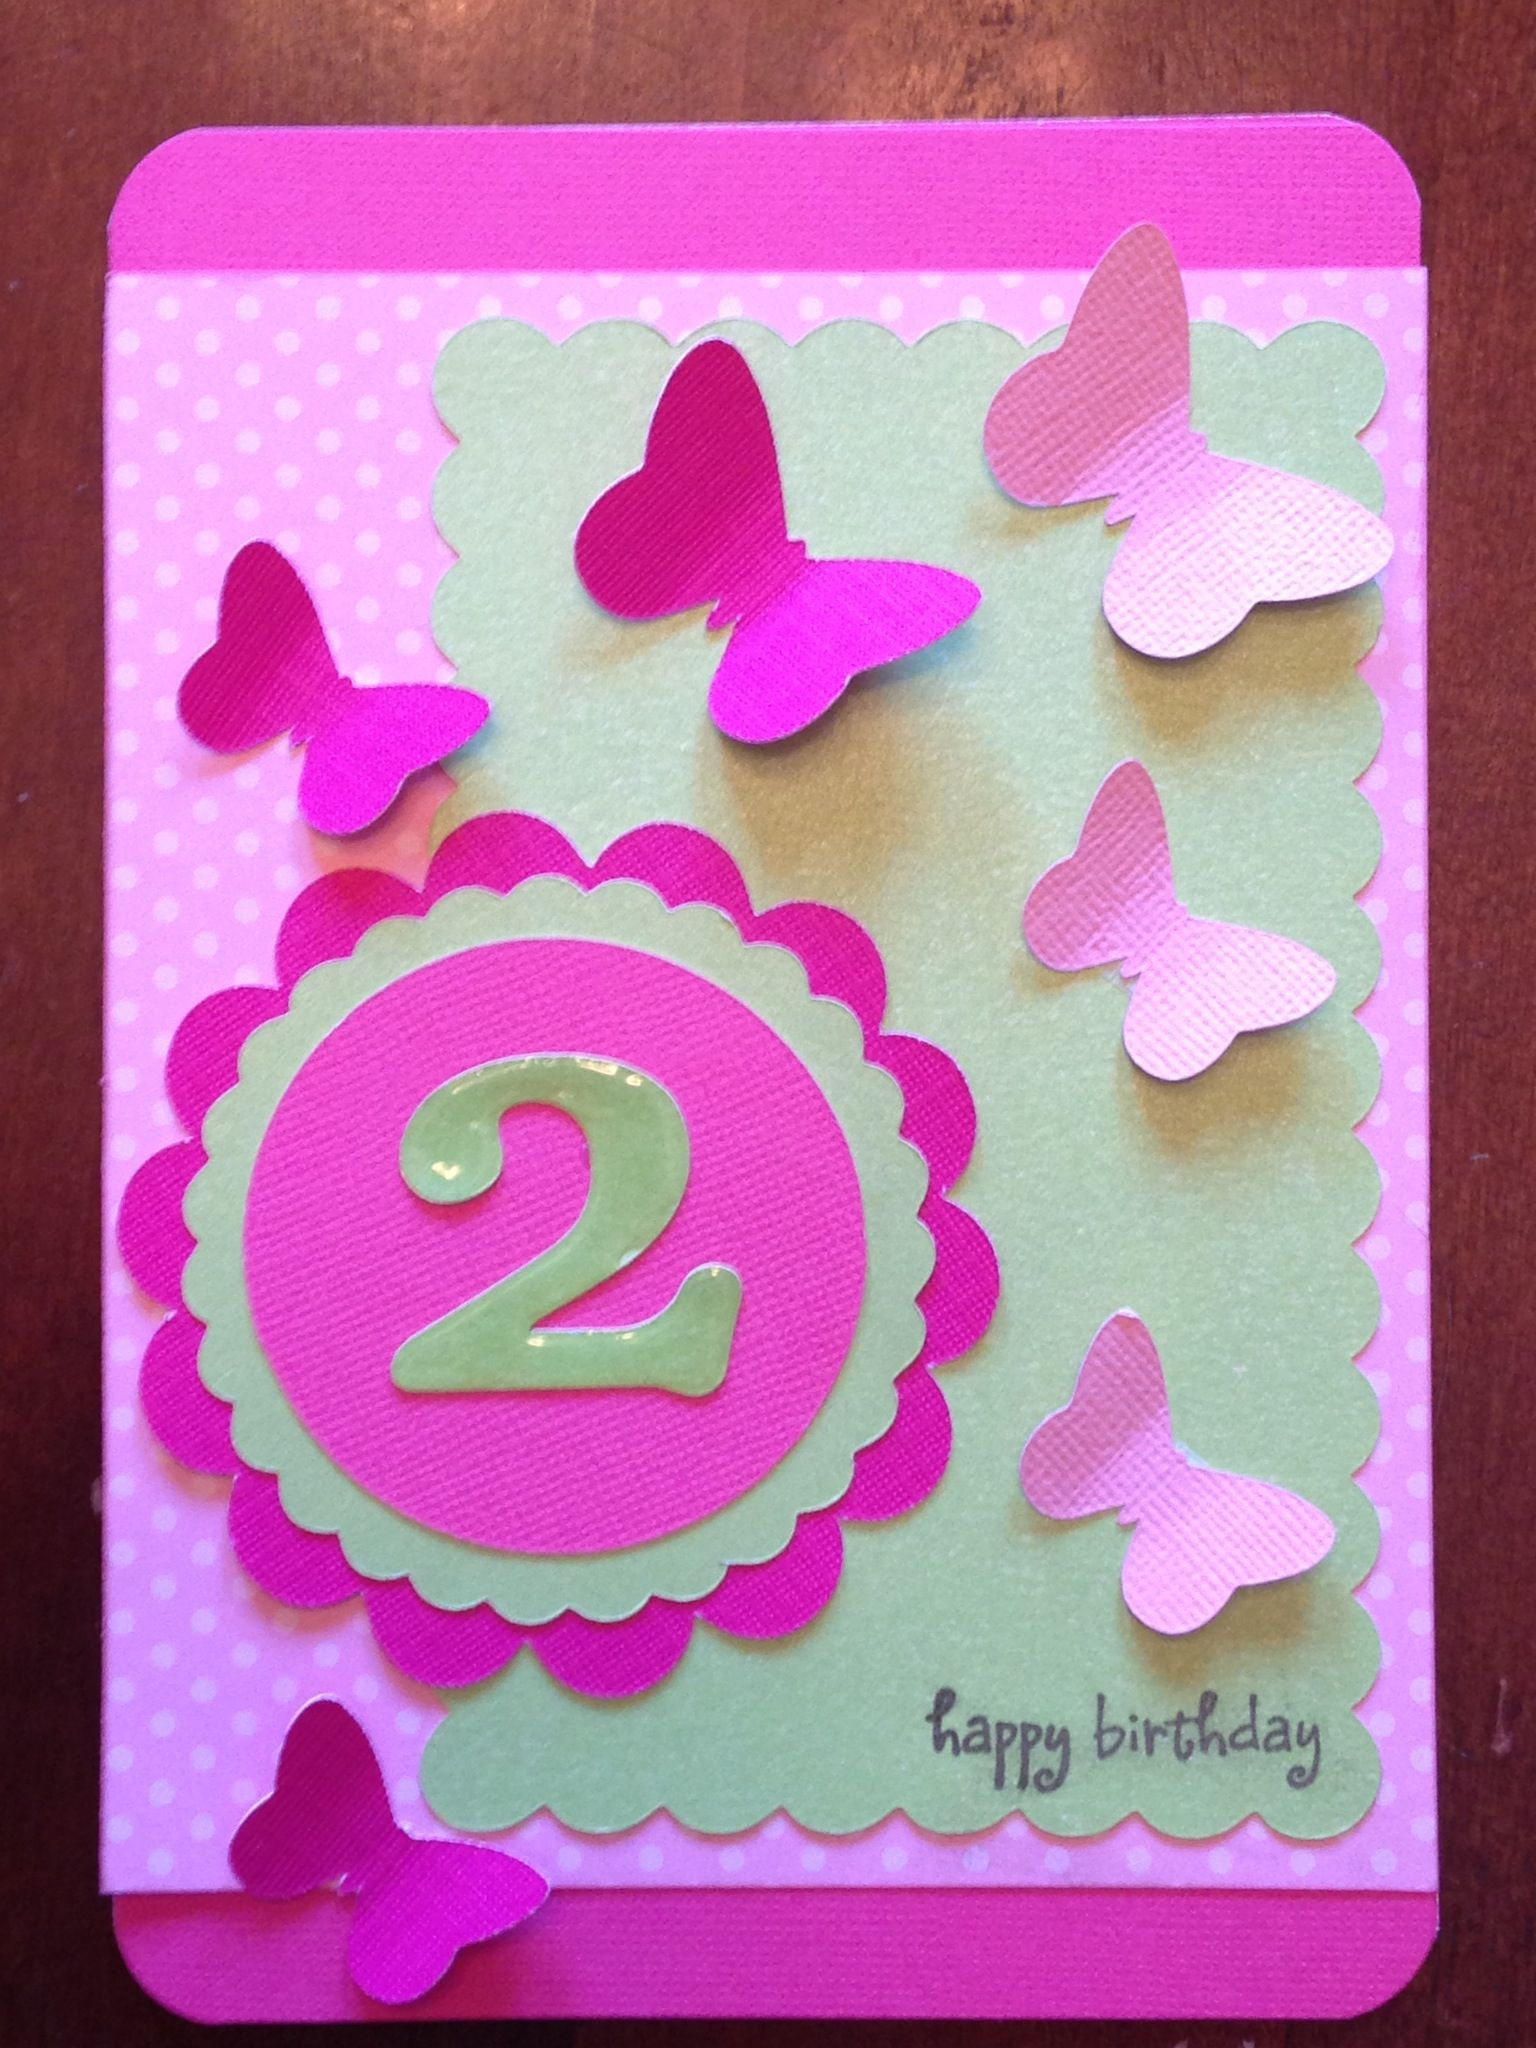 Little girls 2nd birthday card i made card making